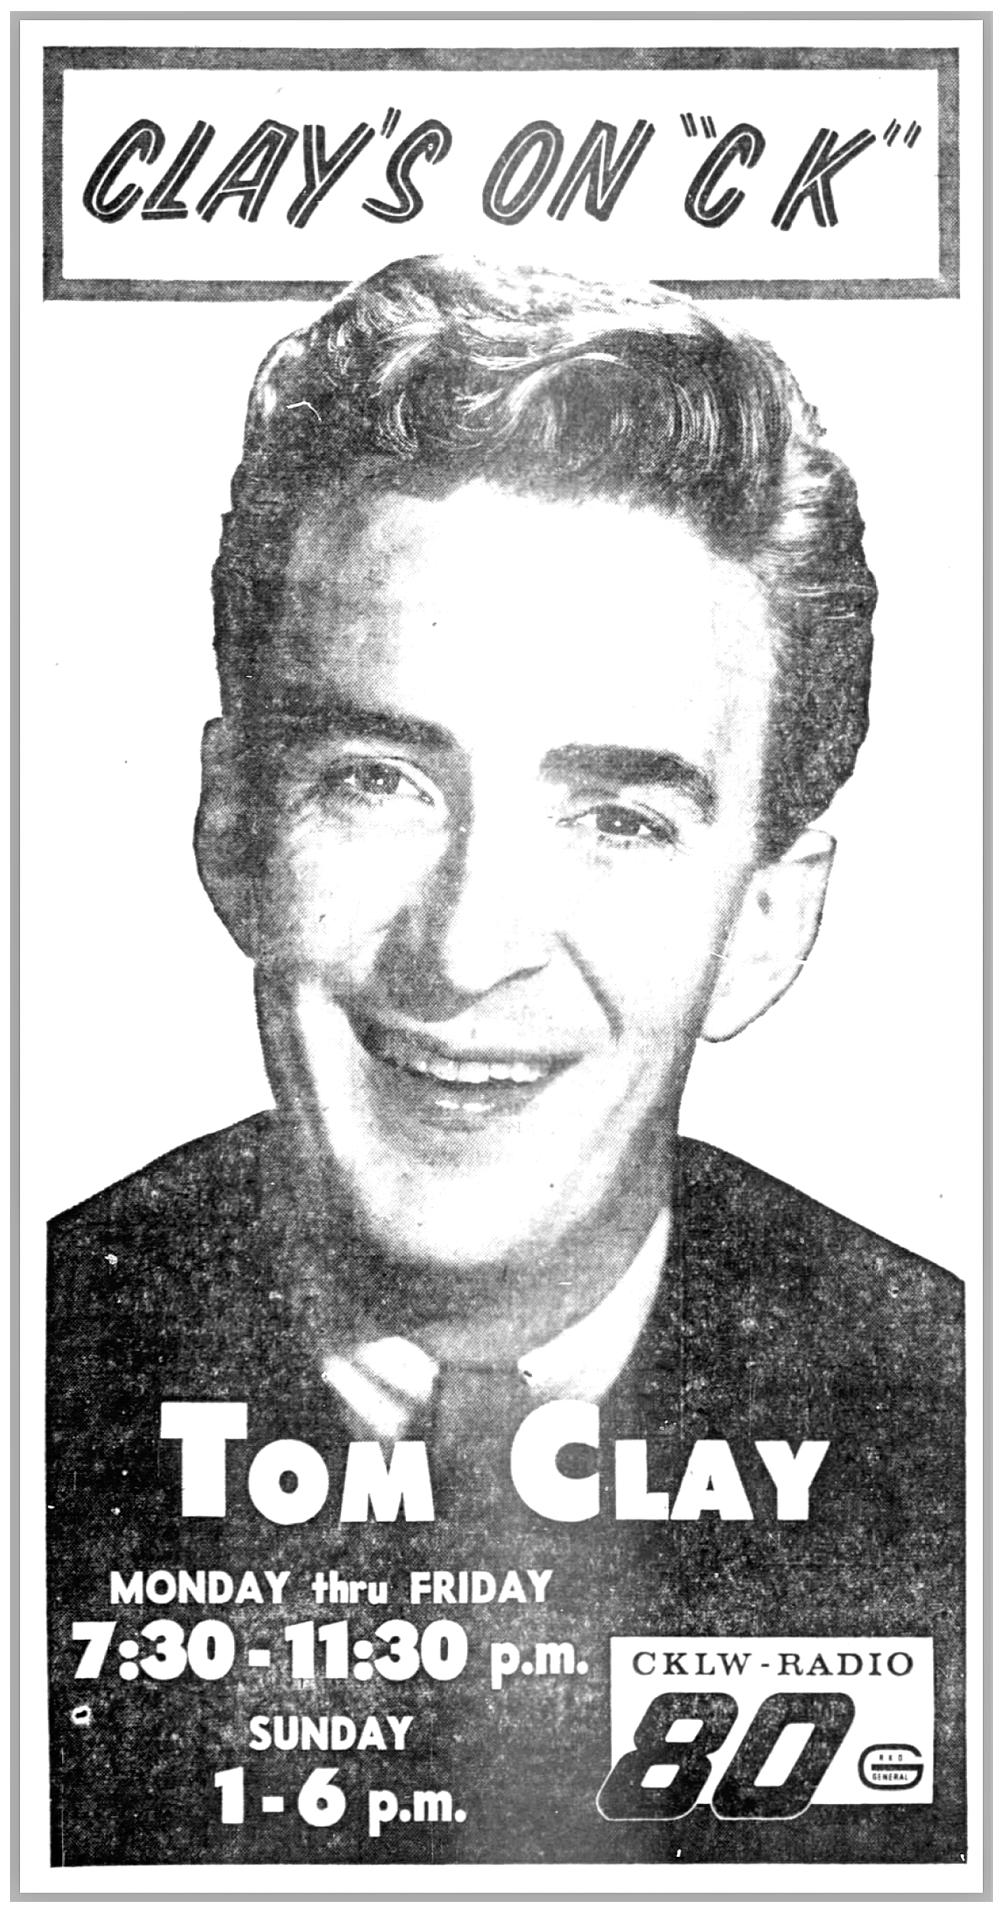 Detroit_Free_Press_Sun__Sep_1__1963_CKLW_Clay_Ad_(mcrfb2)